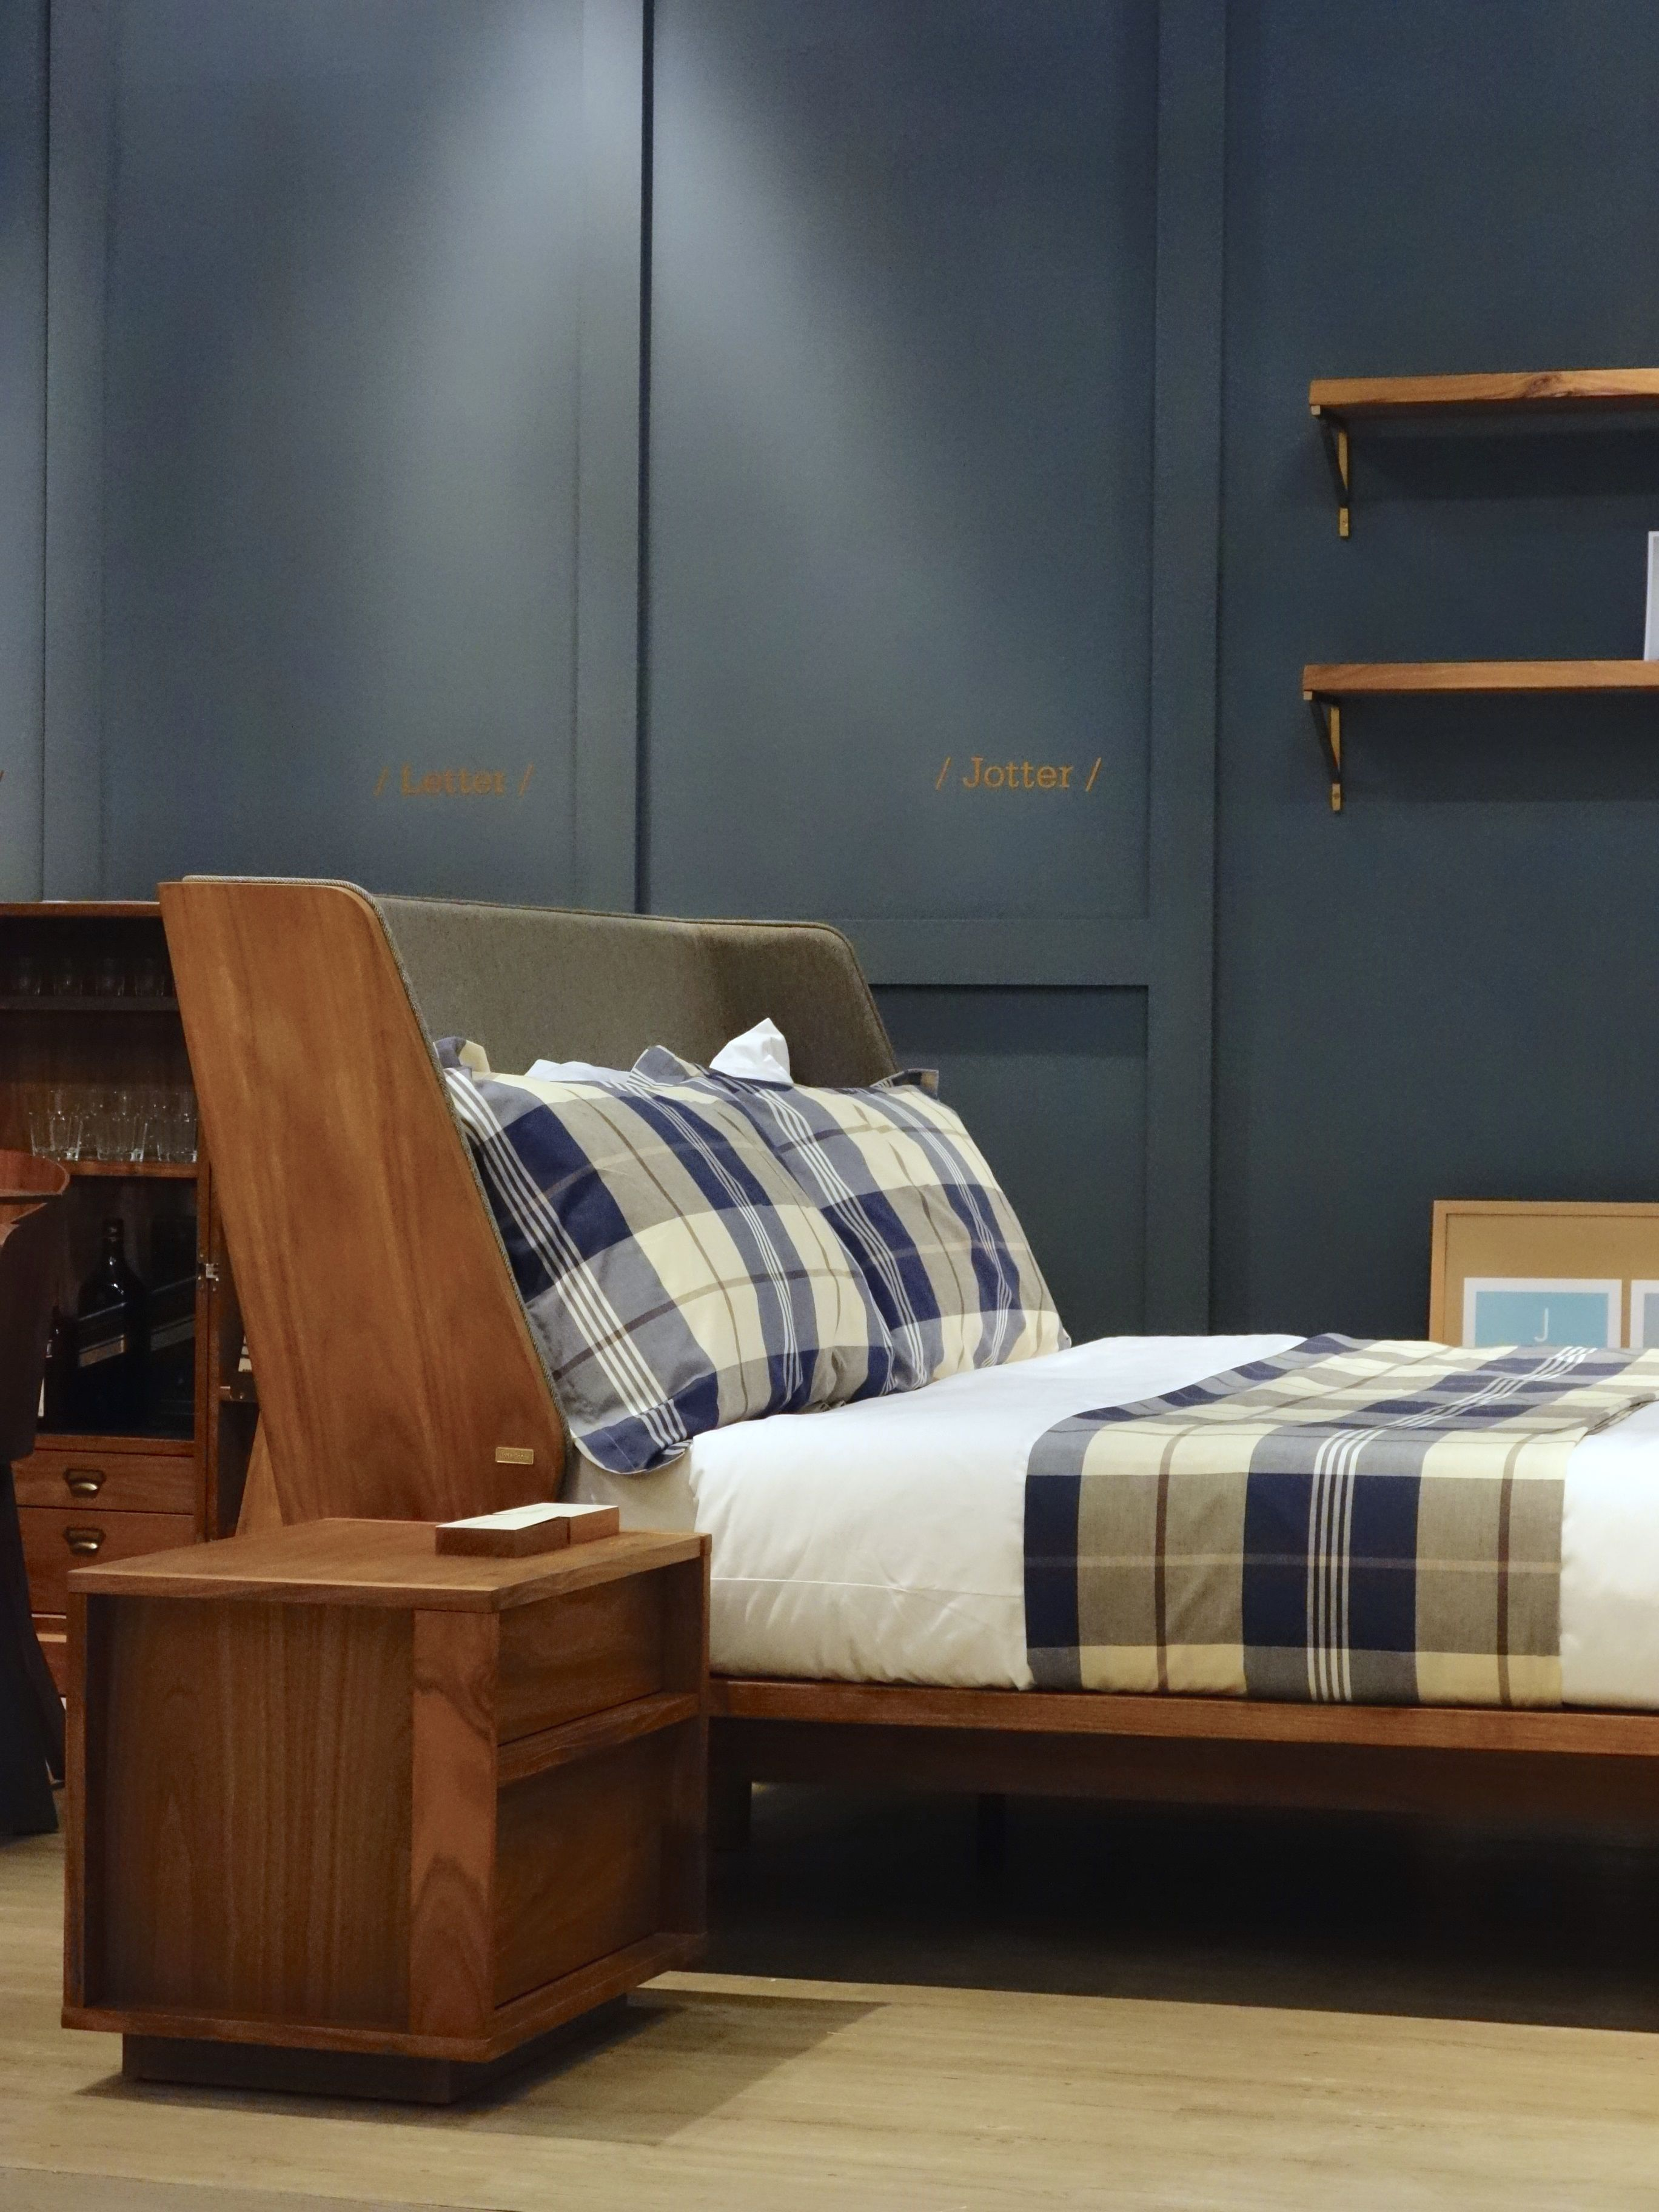 Jotter Bed Blk Bedside Table by Star Living JotterGoods